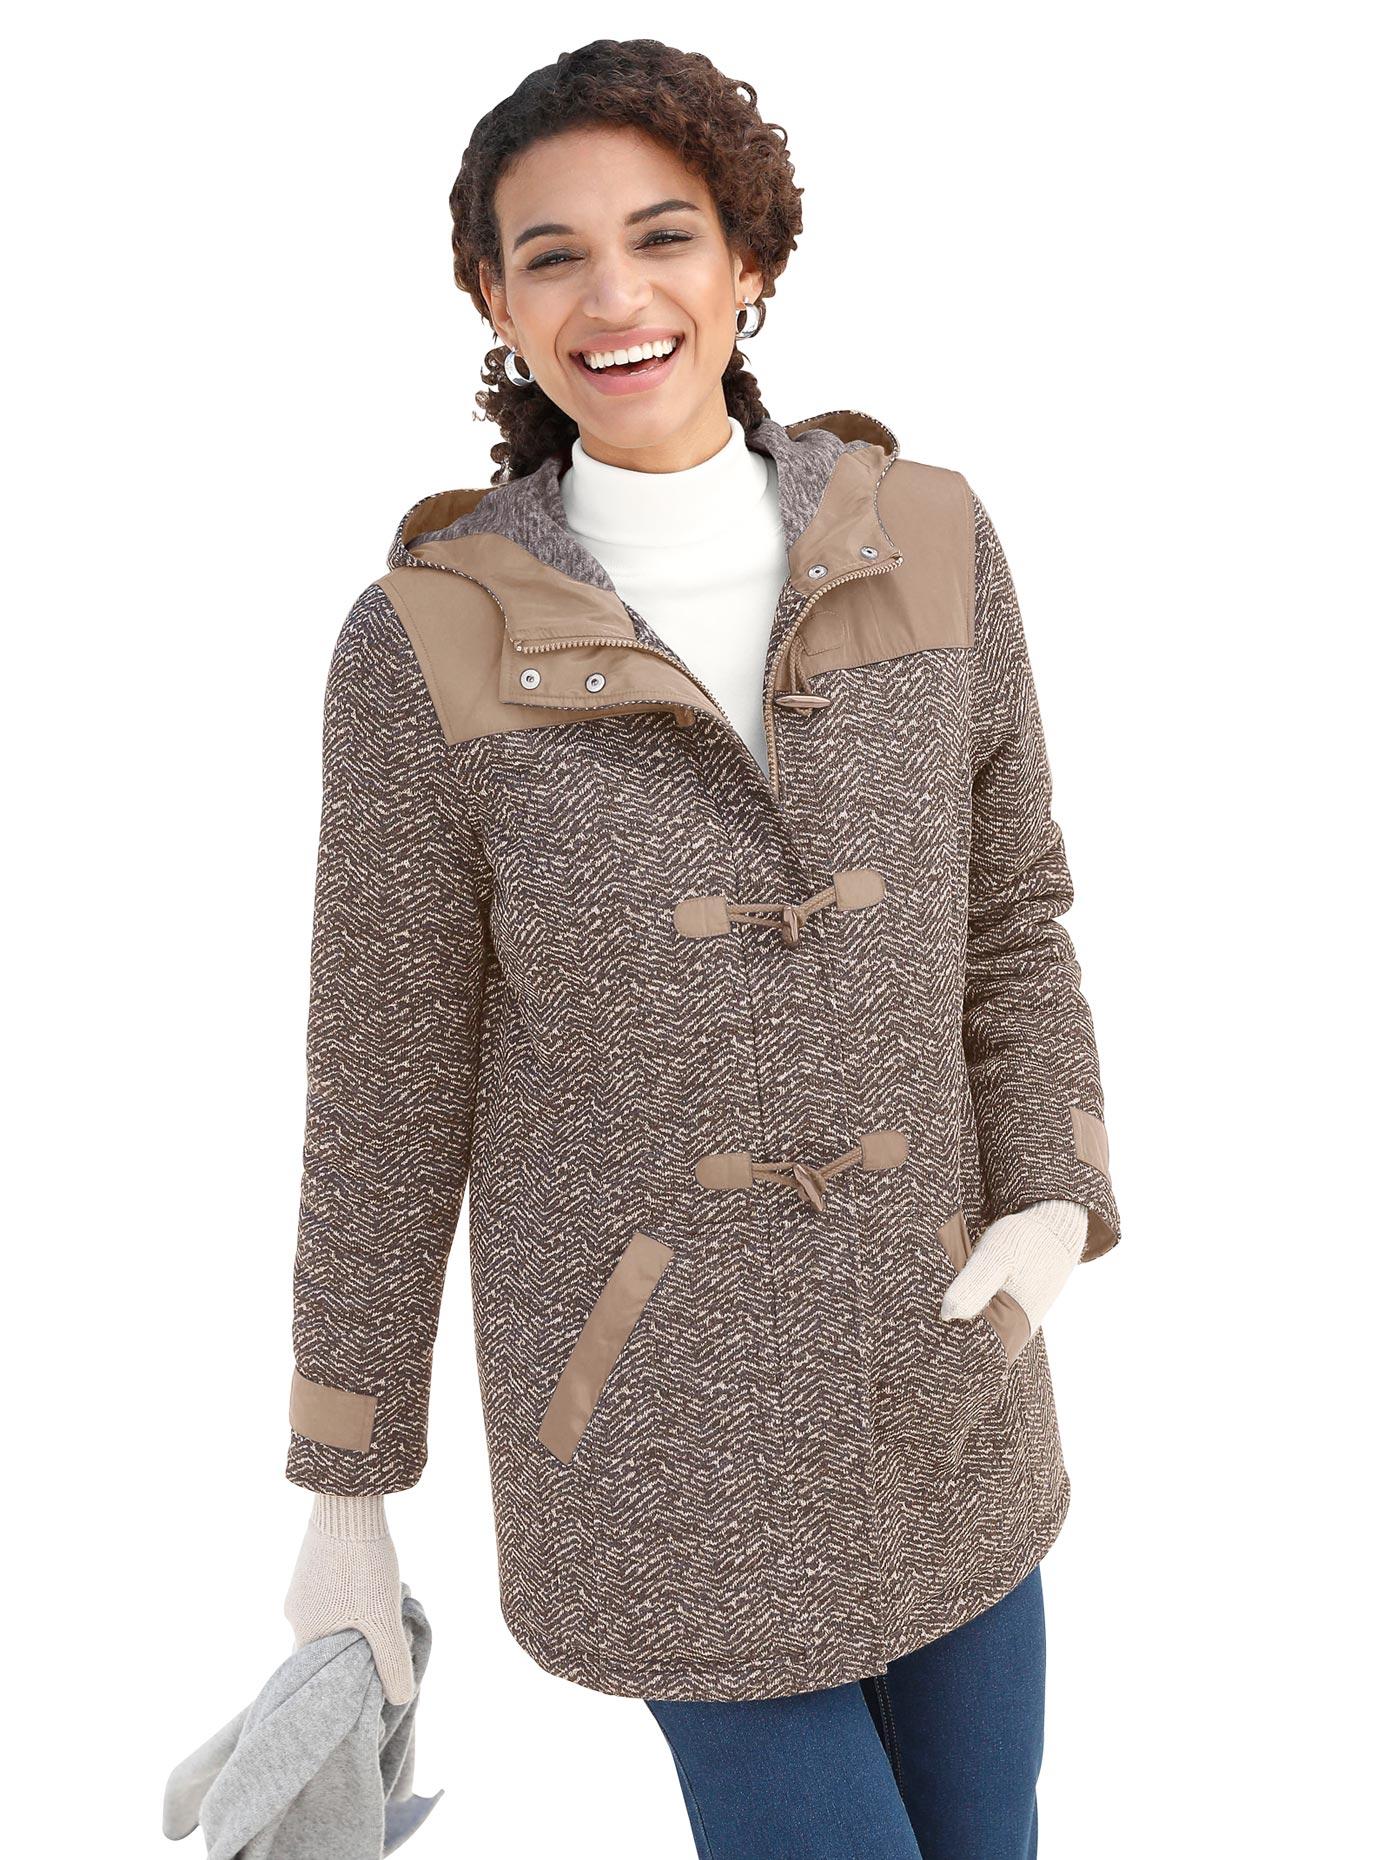 Casual Looks Jacke aus hochwertig garngefärbtem Strick-Fleece   Bekleidung > Jacken > Sonstige Jacken   Casual Looks